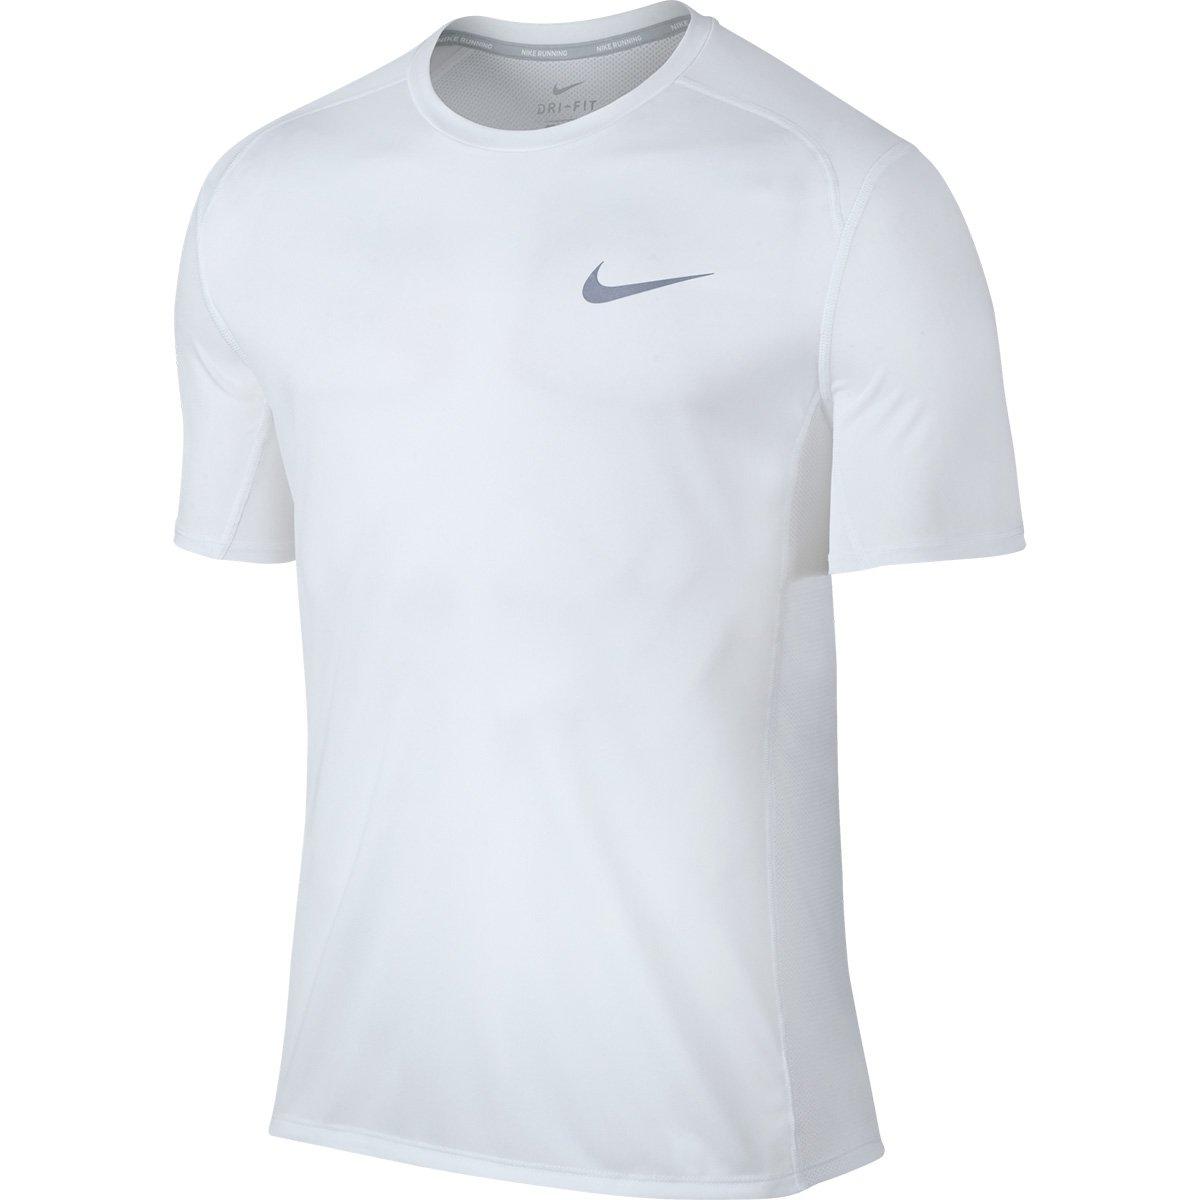 a0b0f05098 Camiseta SS Nike Dri Fit Miler SS Camiseta Masculina Compre Agora bfae4e